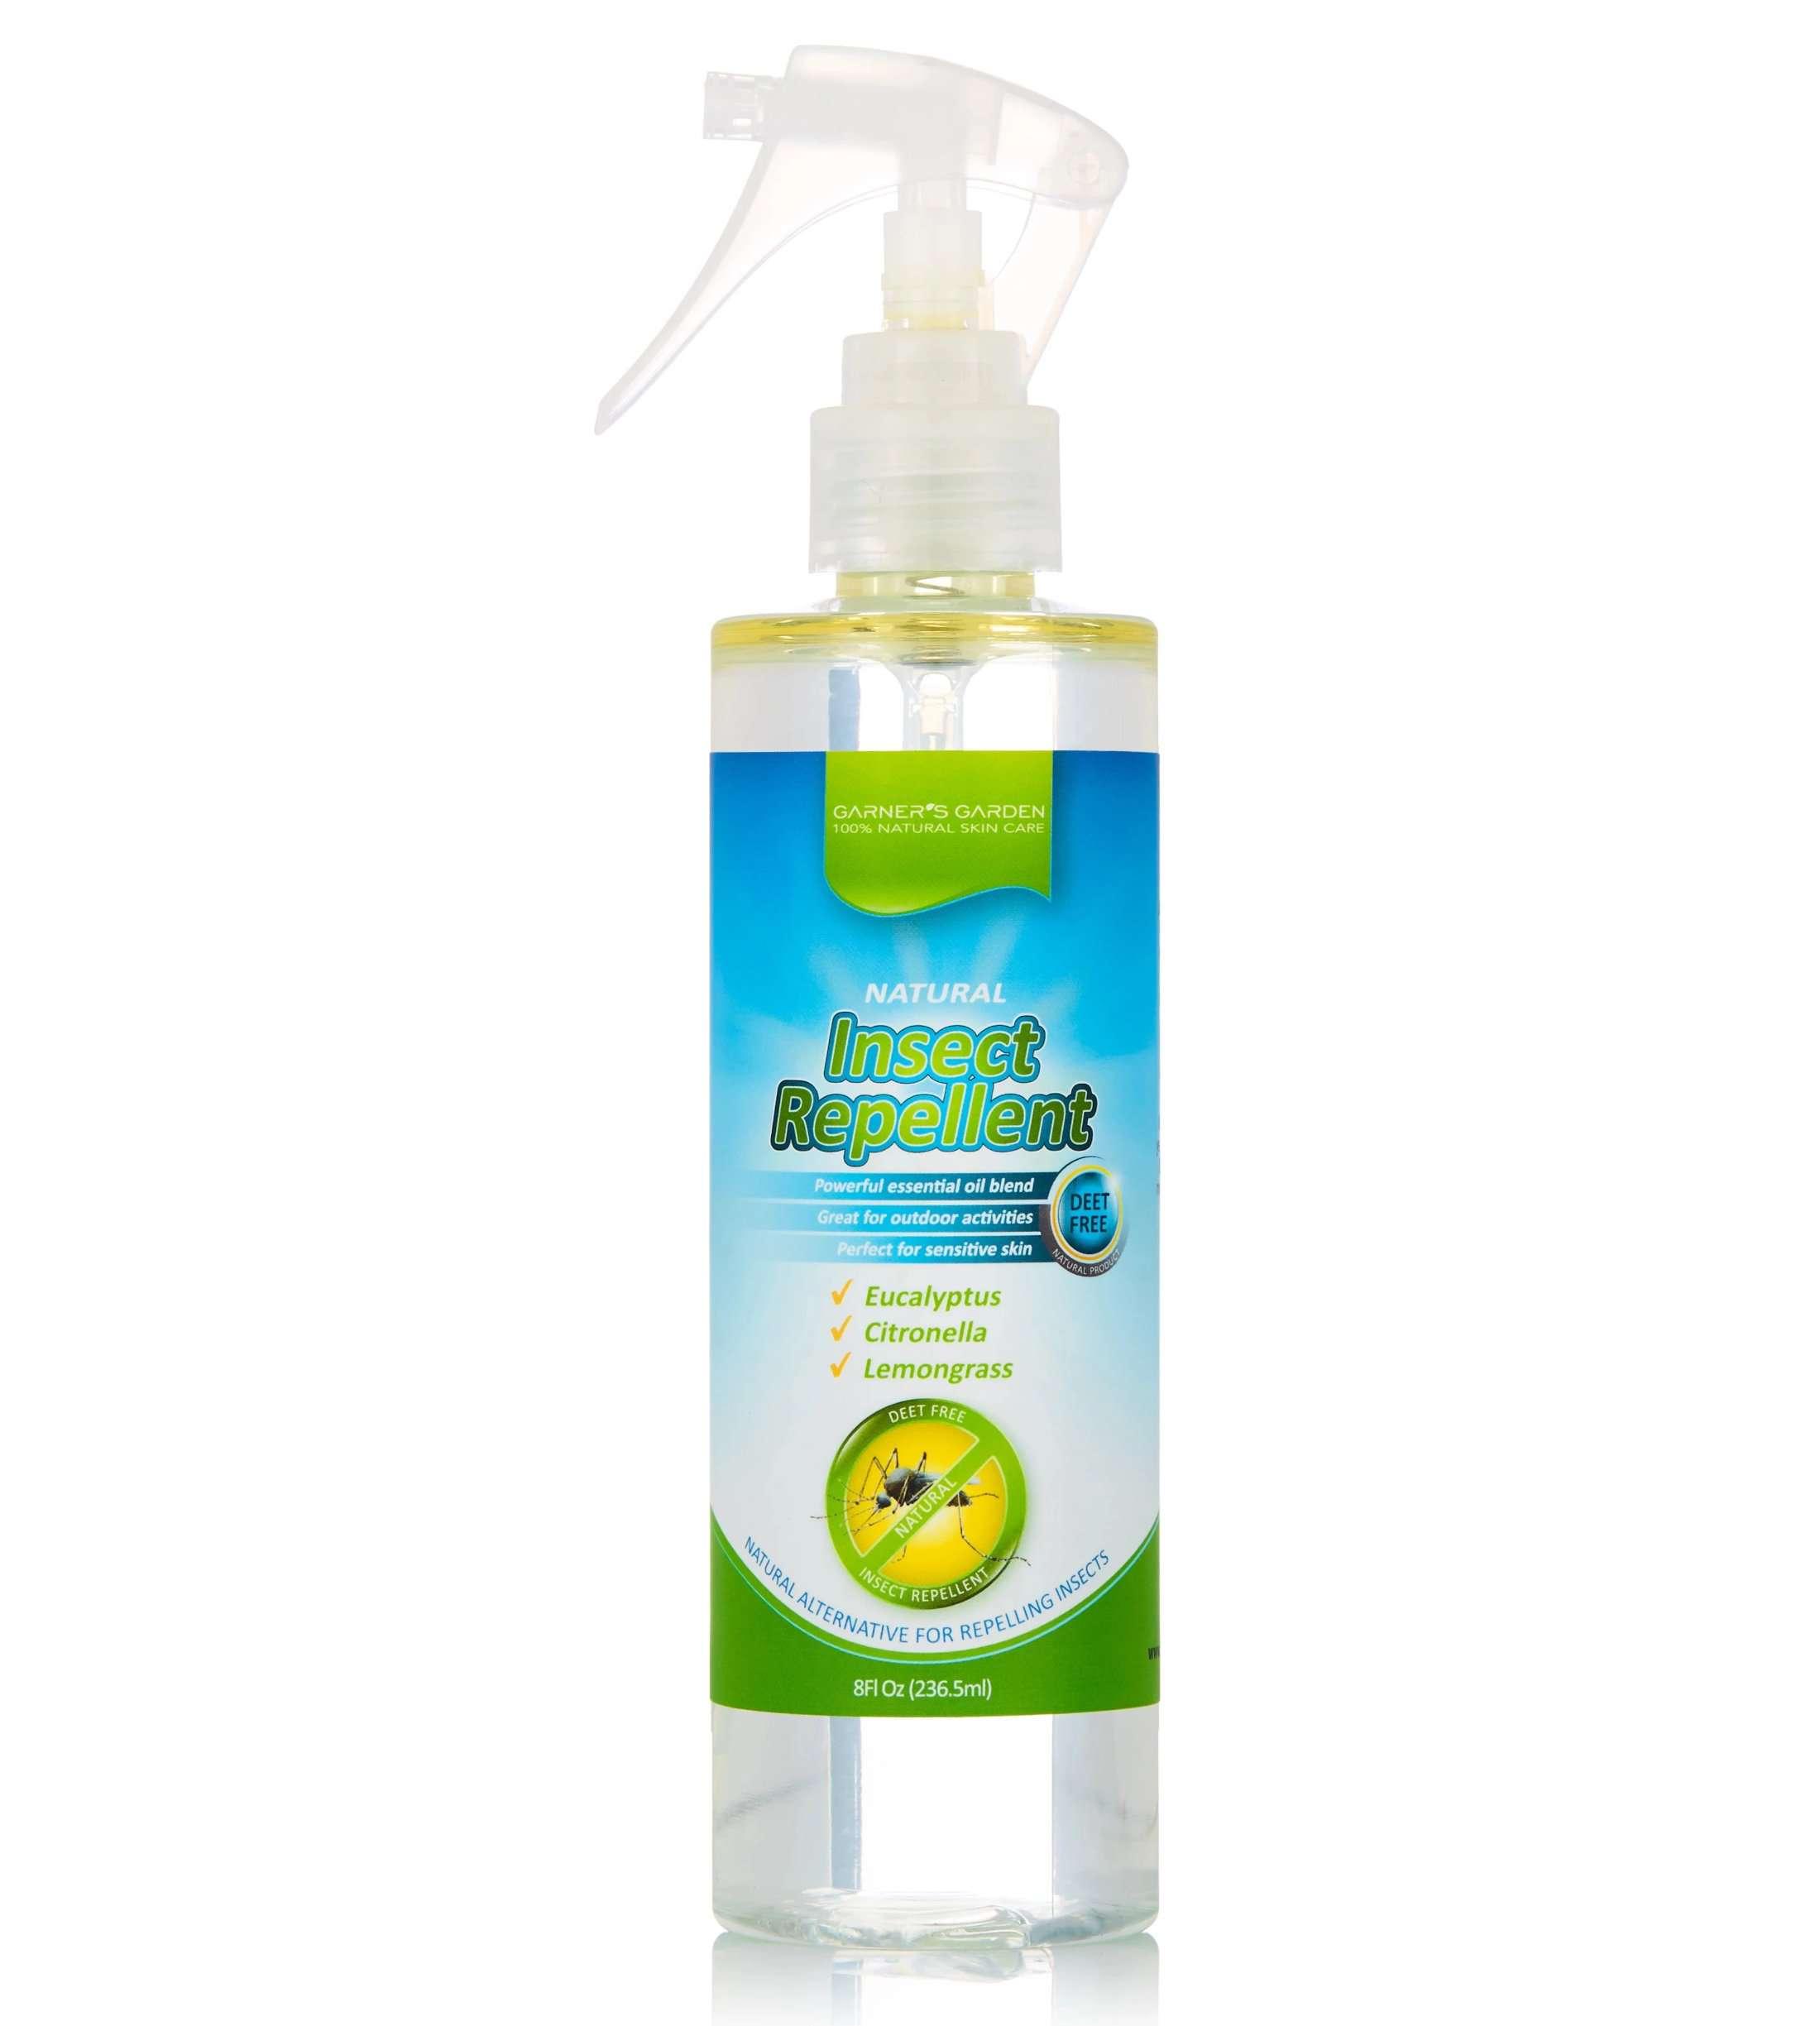 Garner's Garden DEET Free Bug Spray